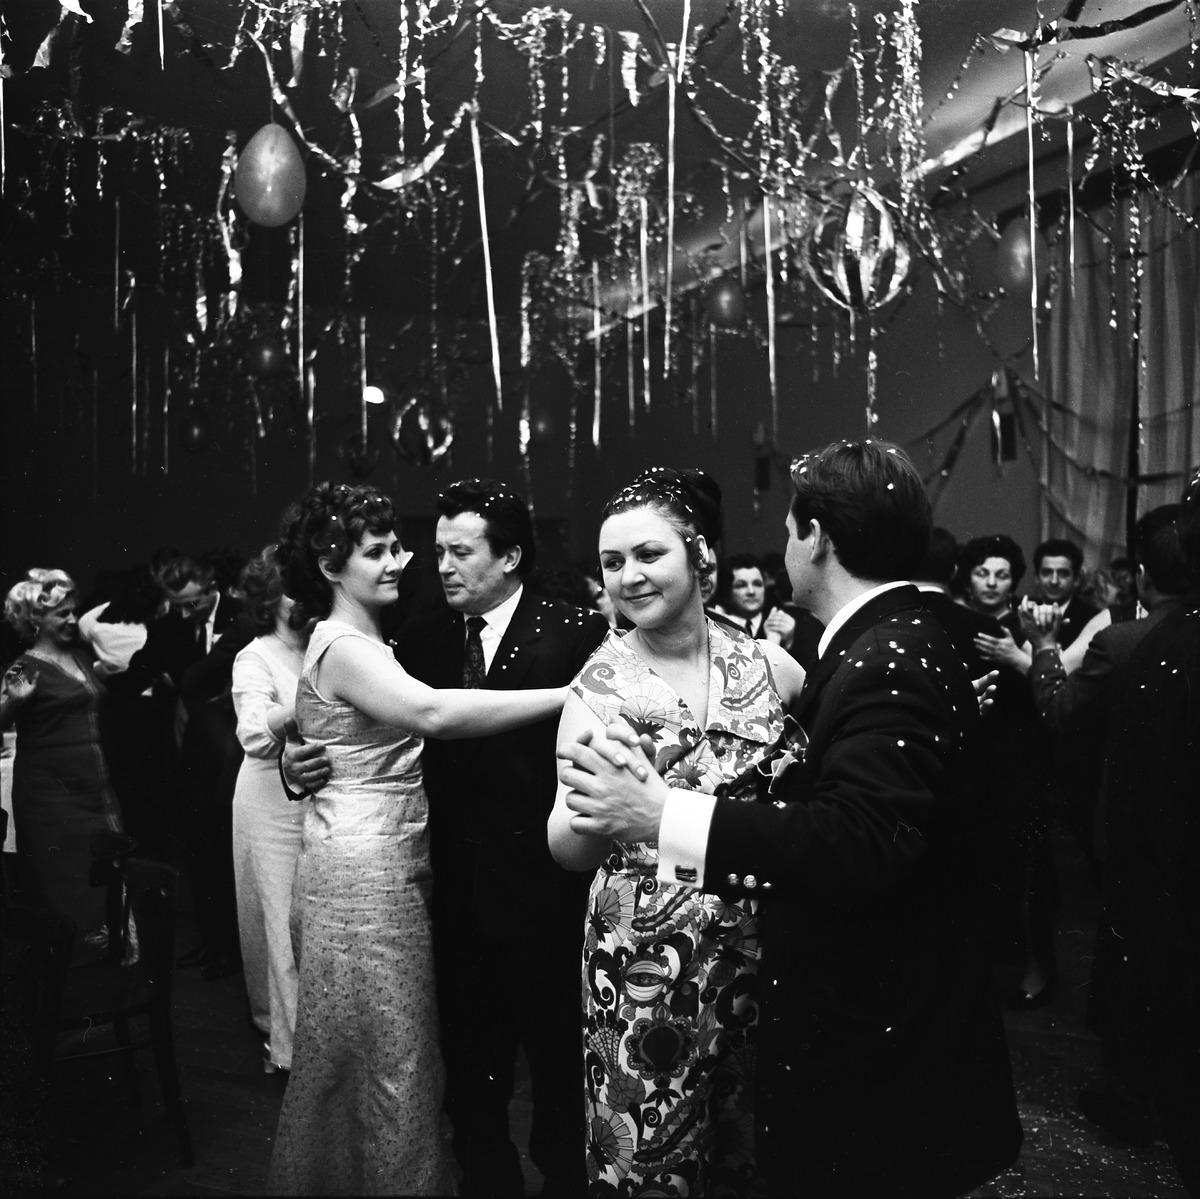 Bal Filmowców w PDK, 1972 r. [7]